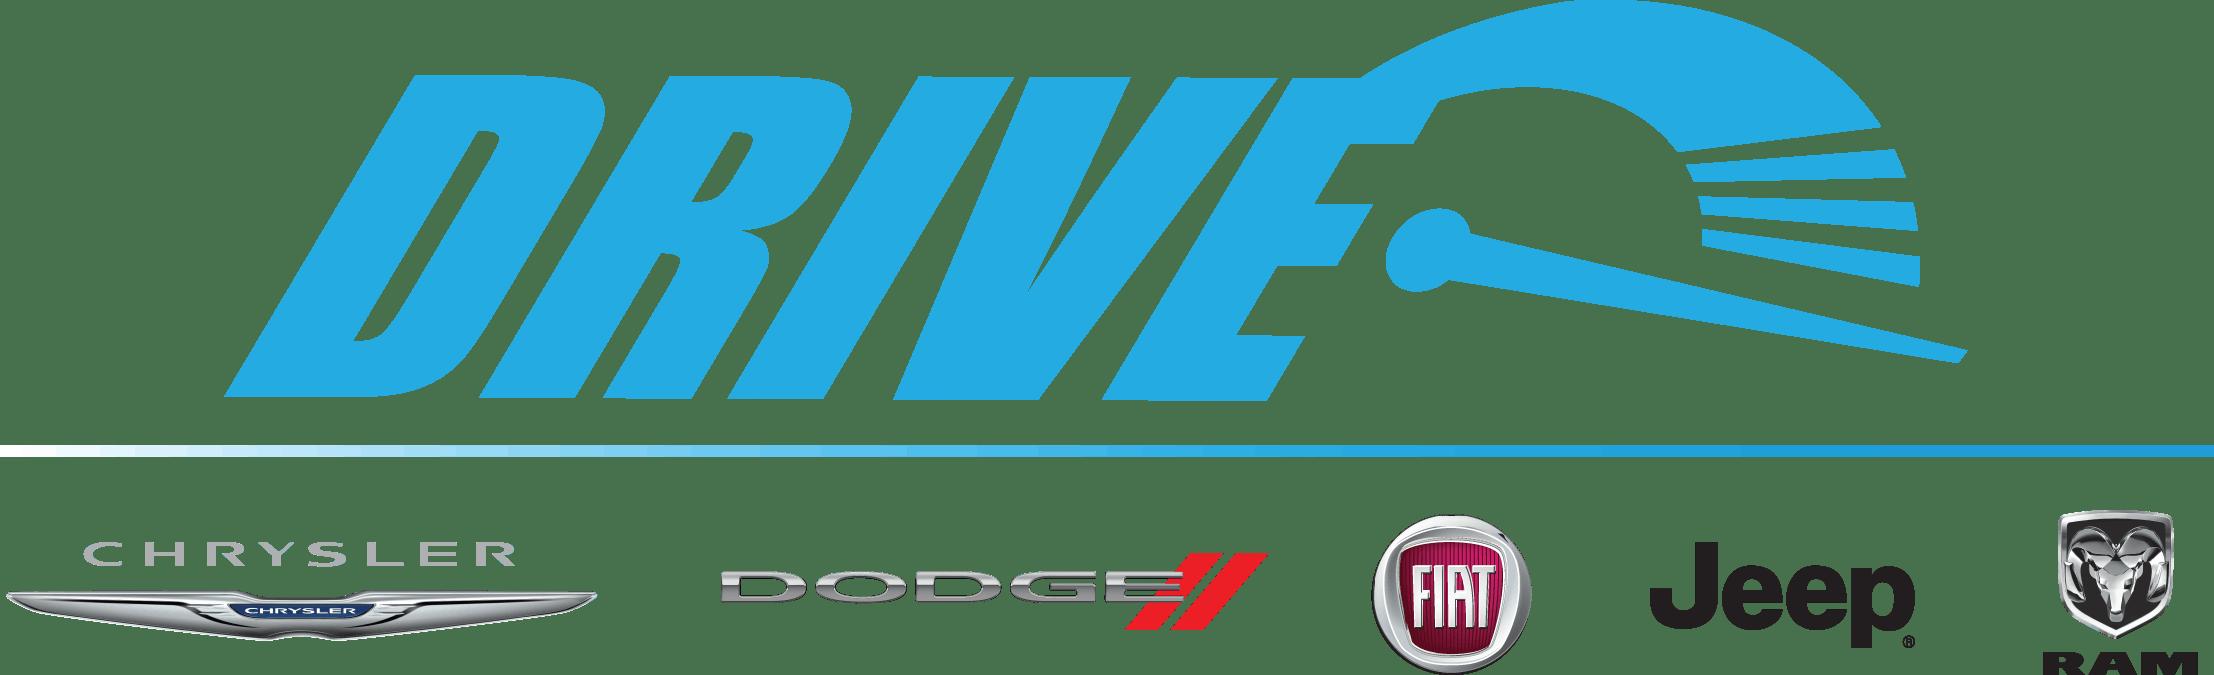 Experience Chrysler, Dodge, Jeep®, Ram Truck